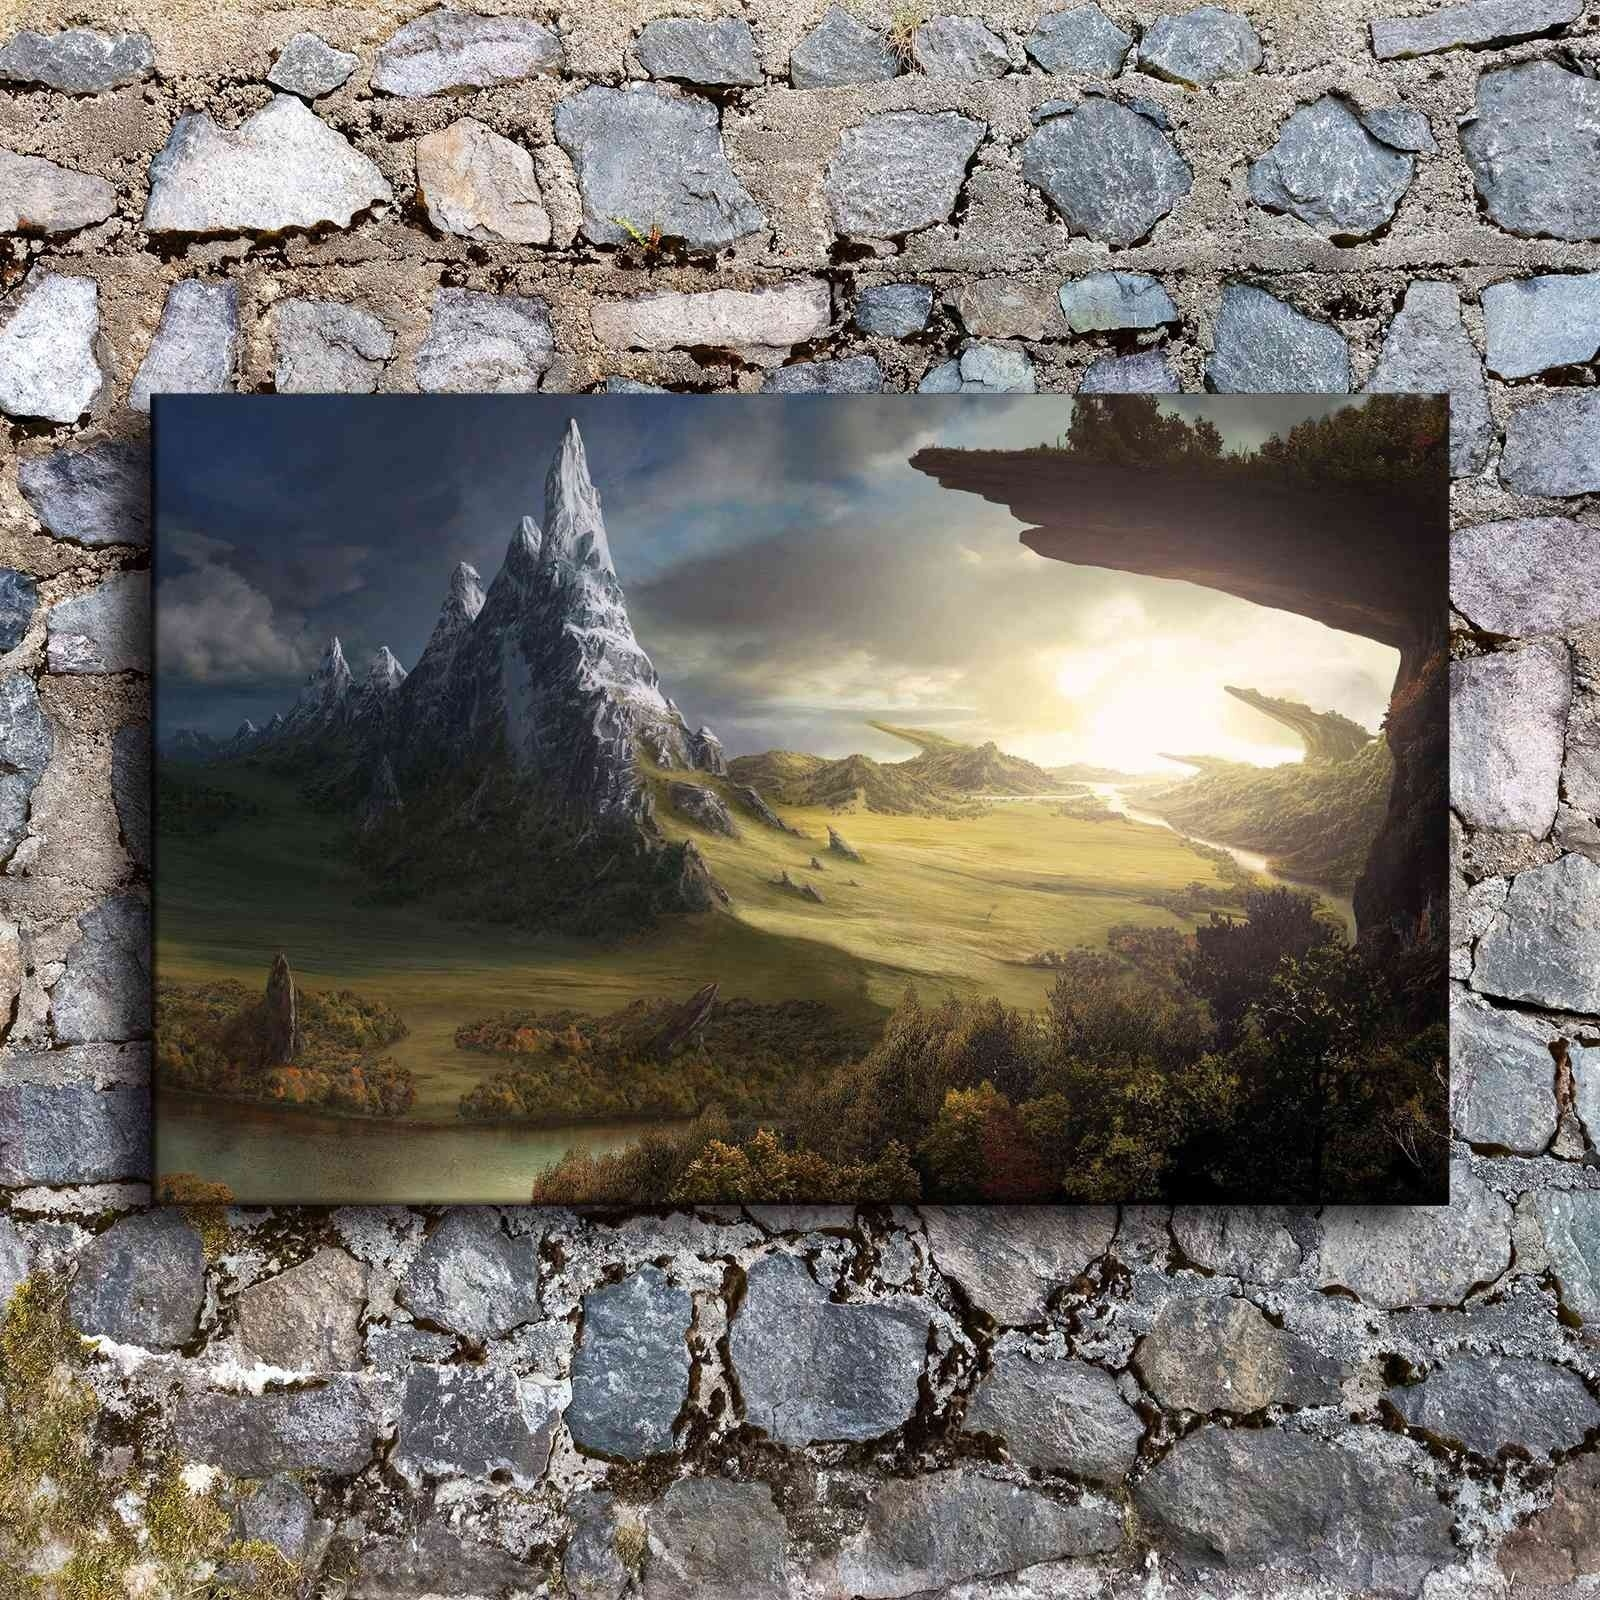 Fantasy Mountain Lake Landscape 5 panel canvas Wall Art Home Decor Print Poster